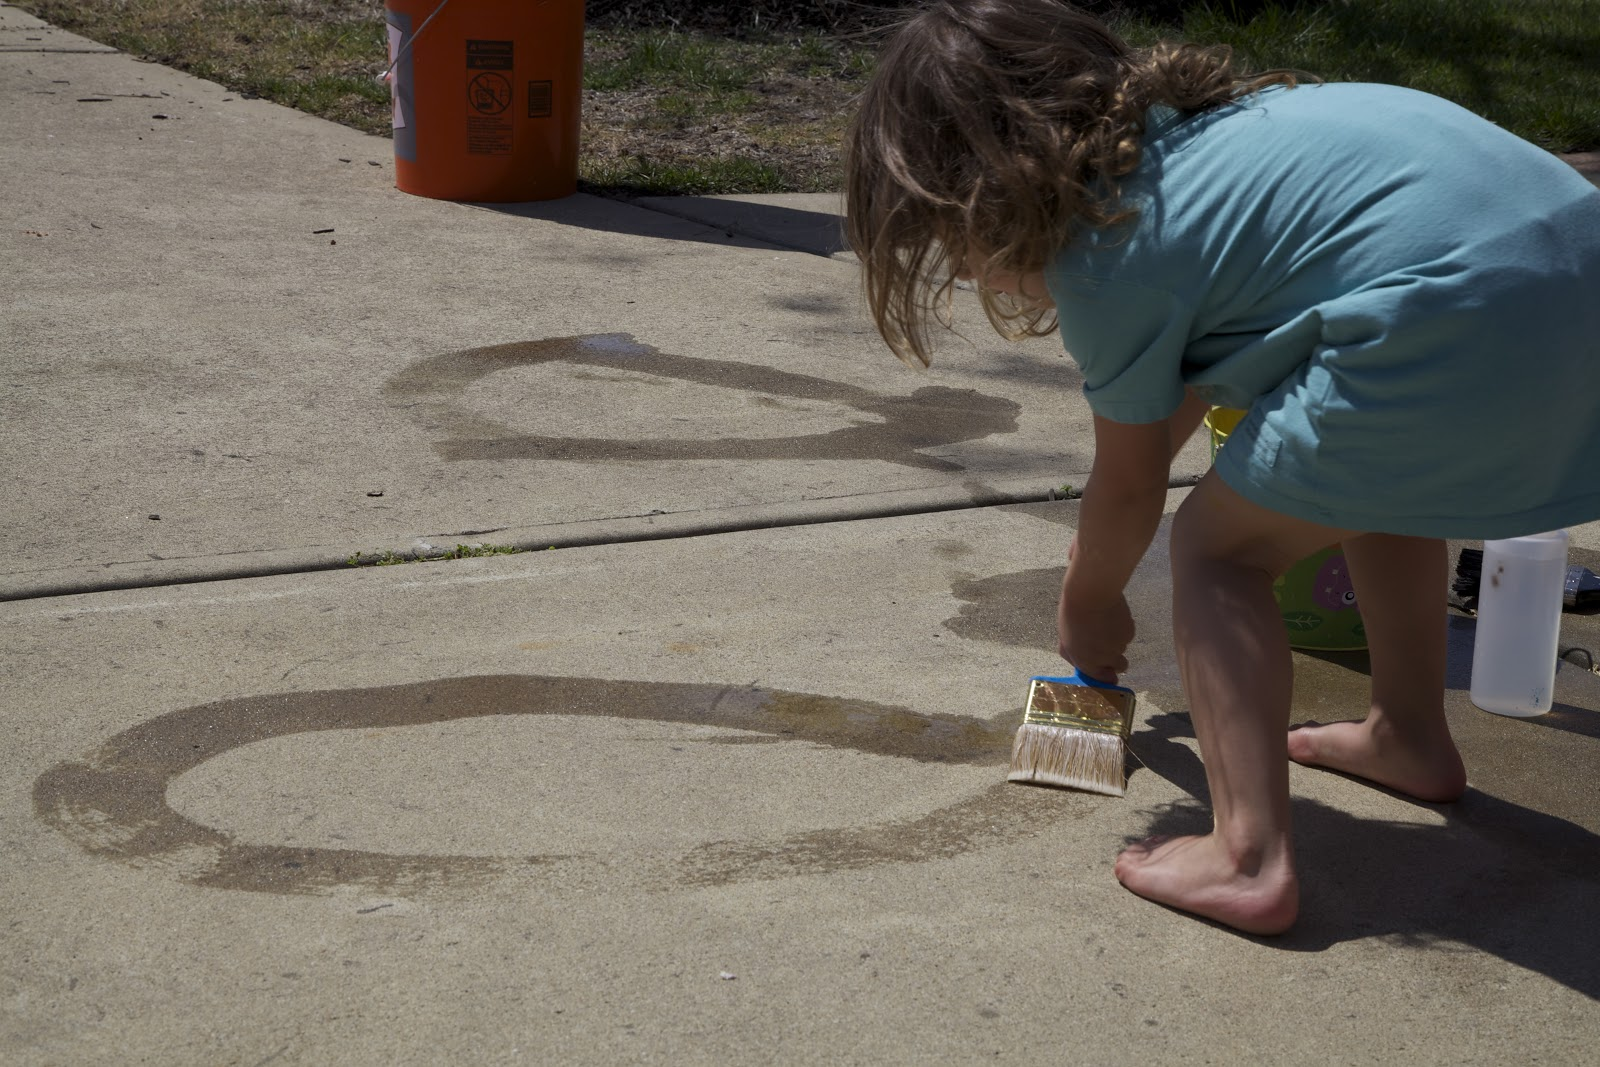 Quot Painting Quot With Water Activities For Children Outdoor